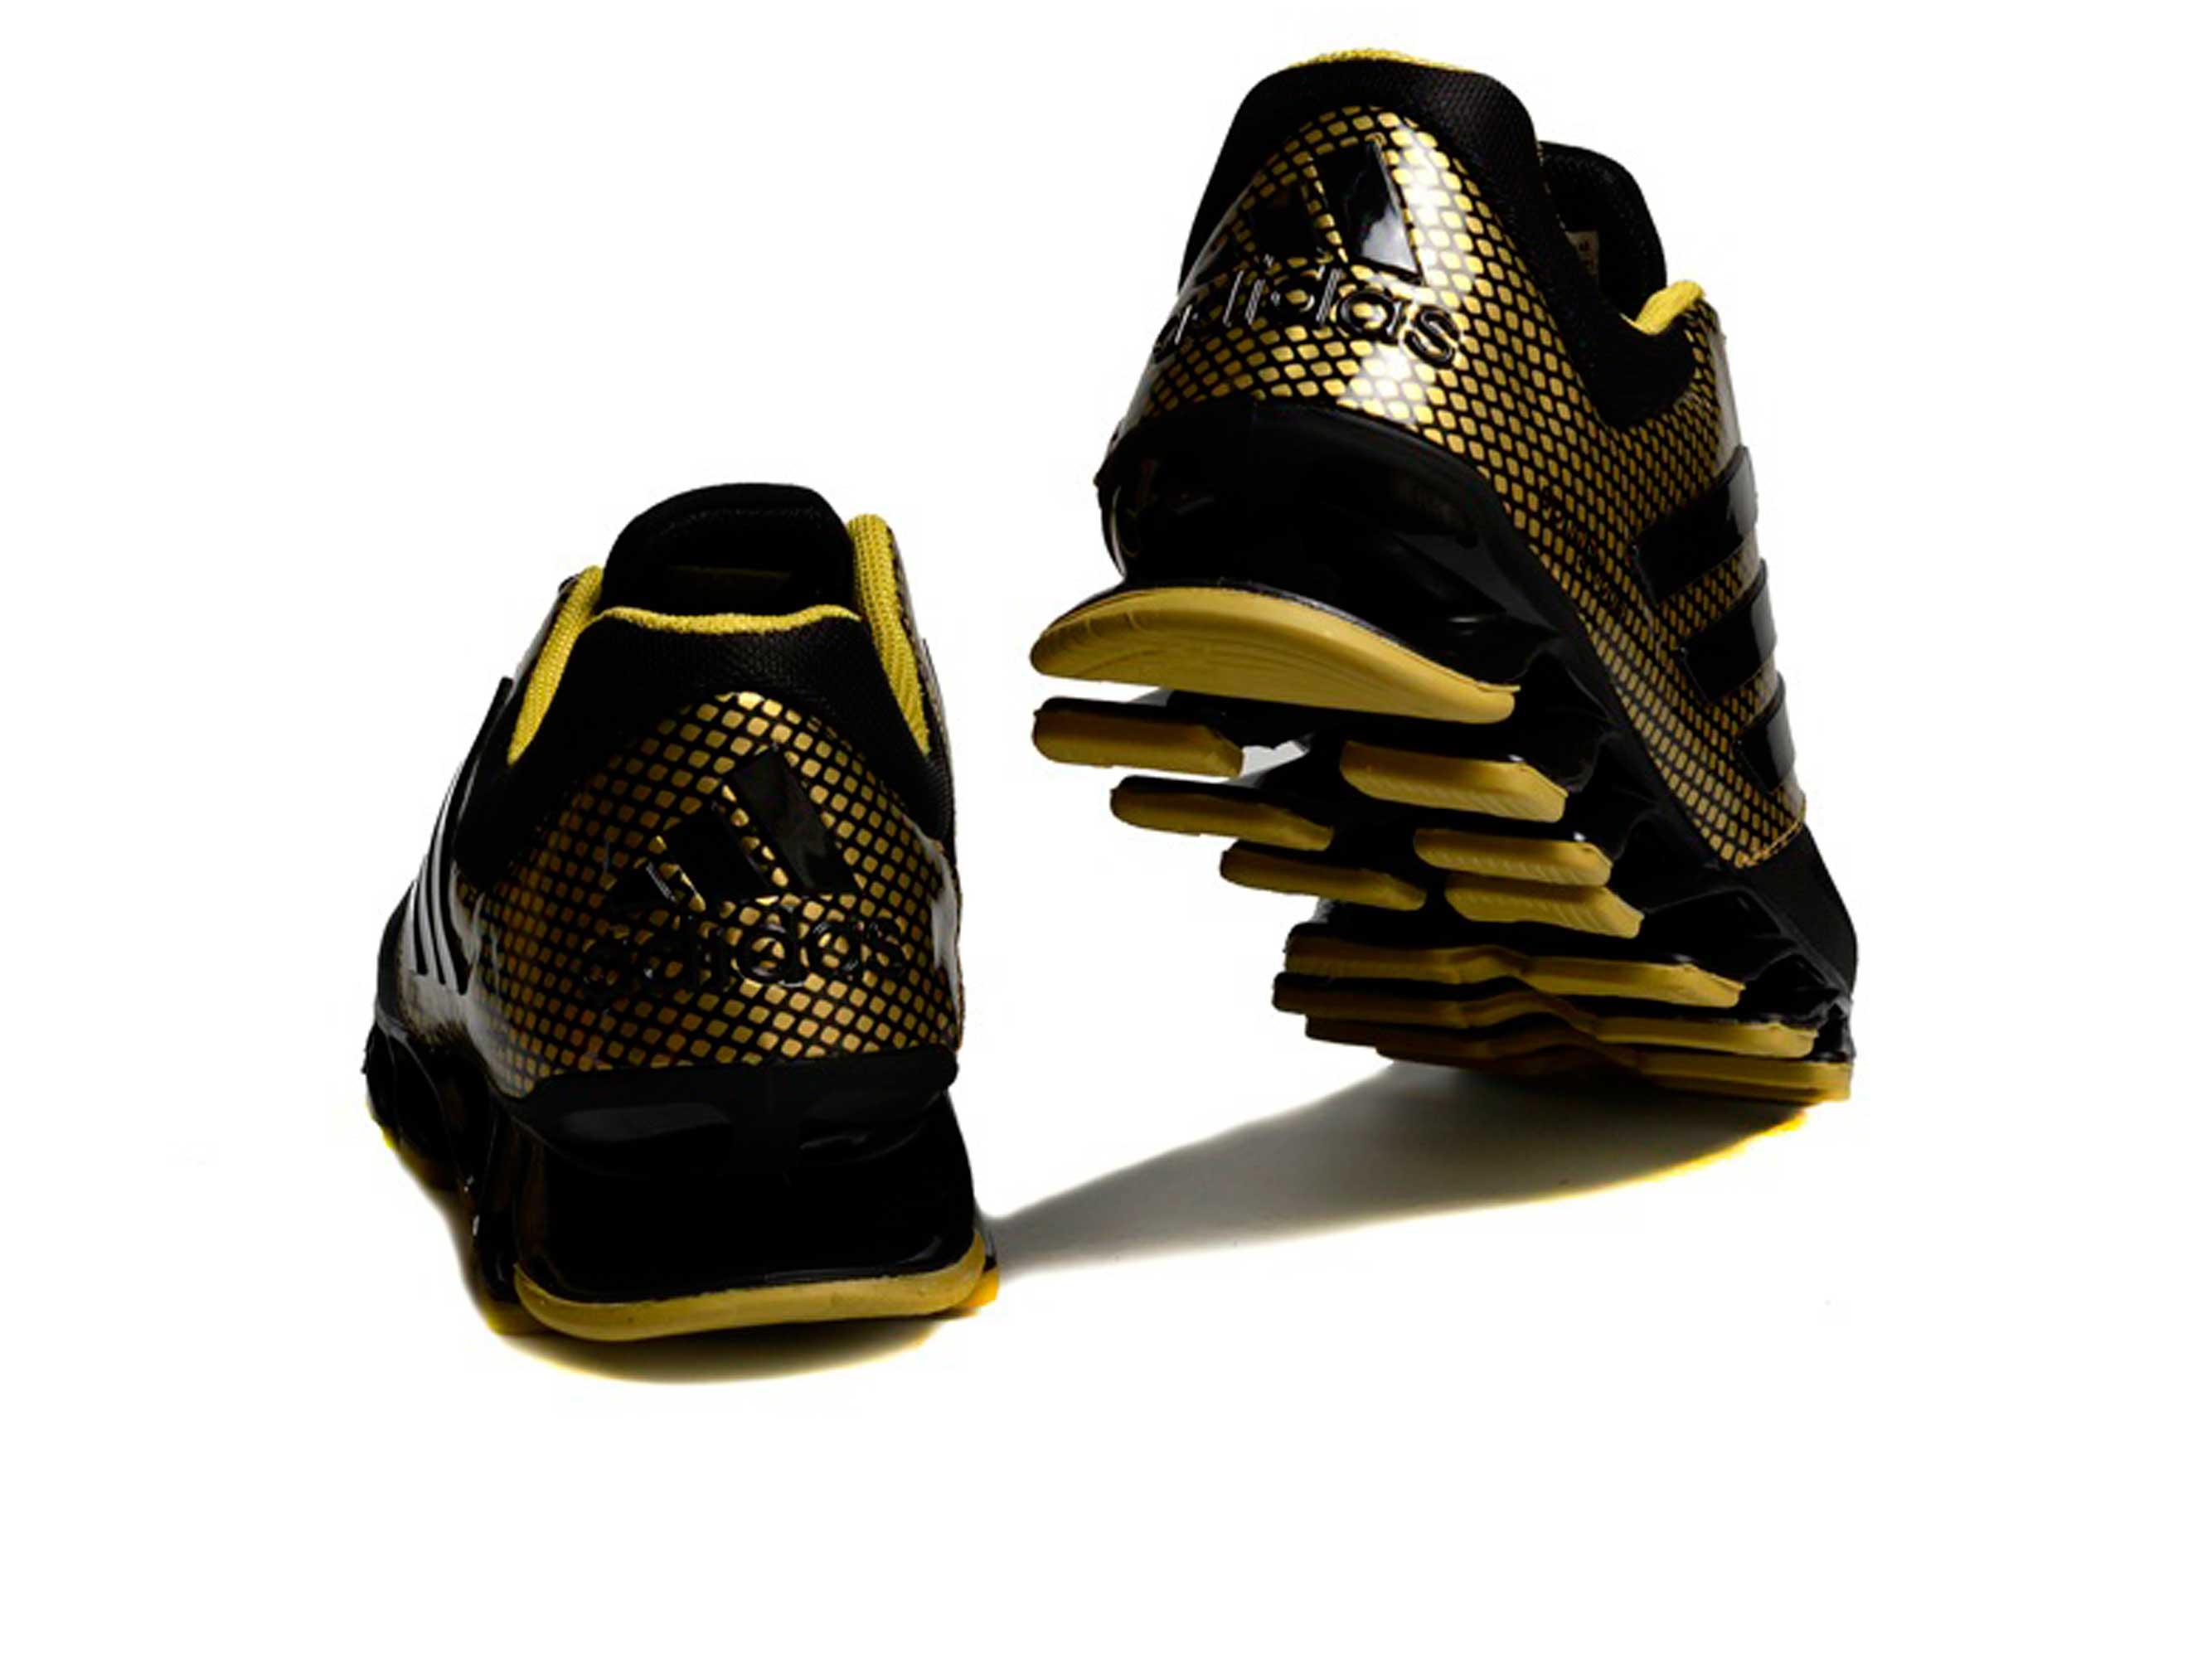 factory authentic c7589 e3c77 ... springblade drive 2.0 navy black gold . 2c2e1 b2091 purchase womens  adidas springblade drive 2.0 shoes running shoes sports shoes black orange  m41s1782 ...